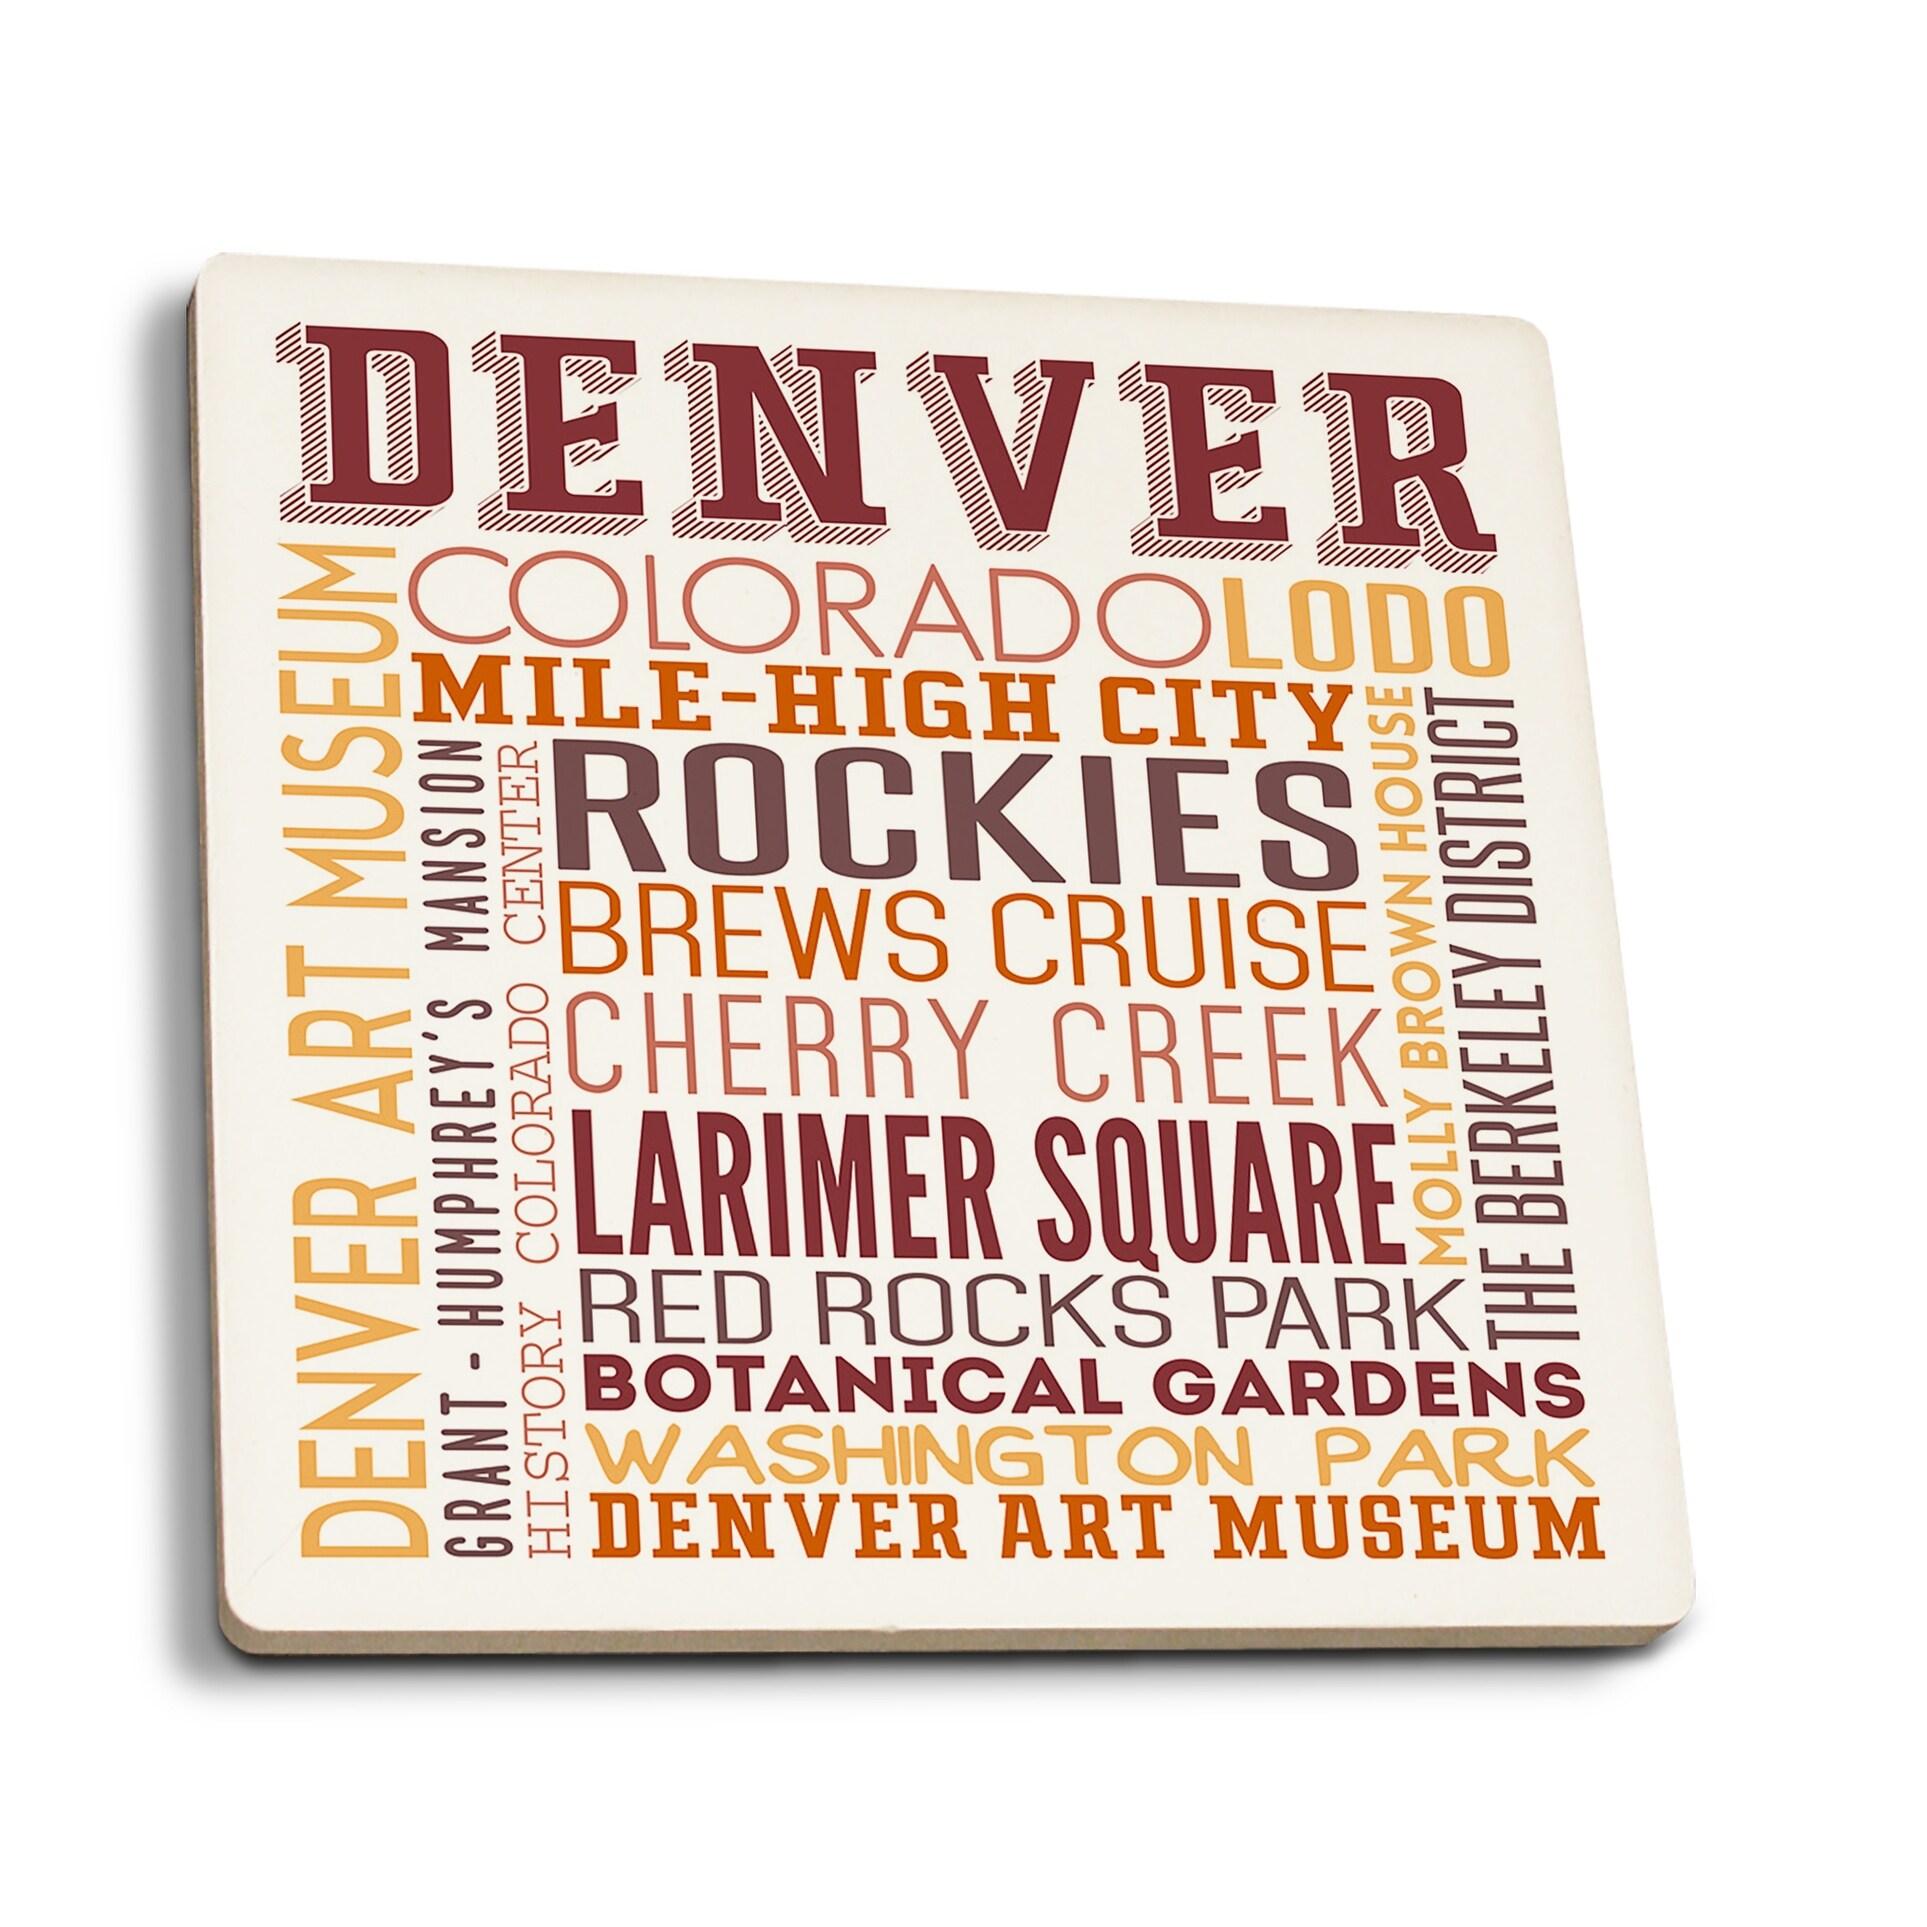 Denver, Colorado - Typography - Lantern Press Artwork (Set of 4 Ceramic  Coasters - Cork-backed, Absorbent) - Ceramic Coasters